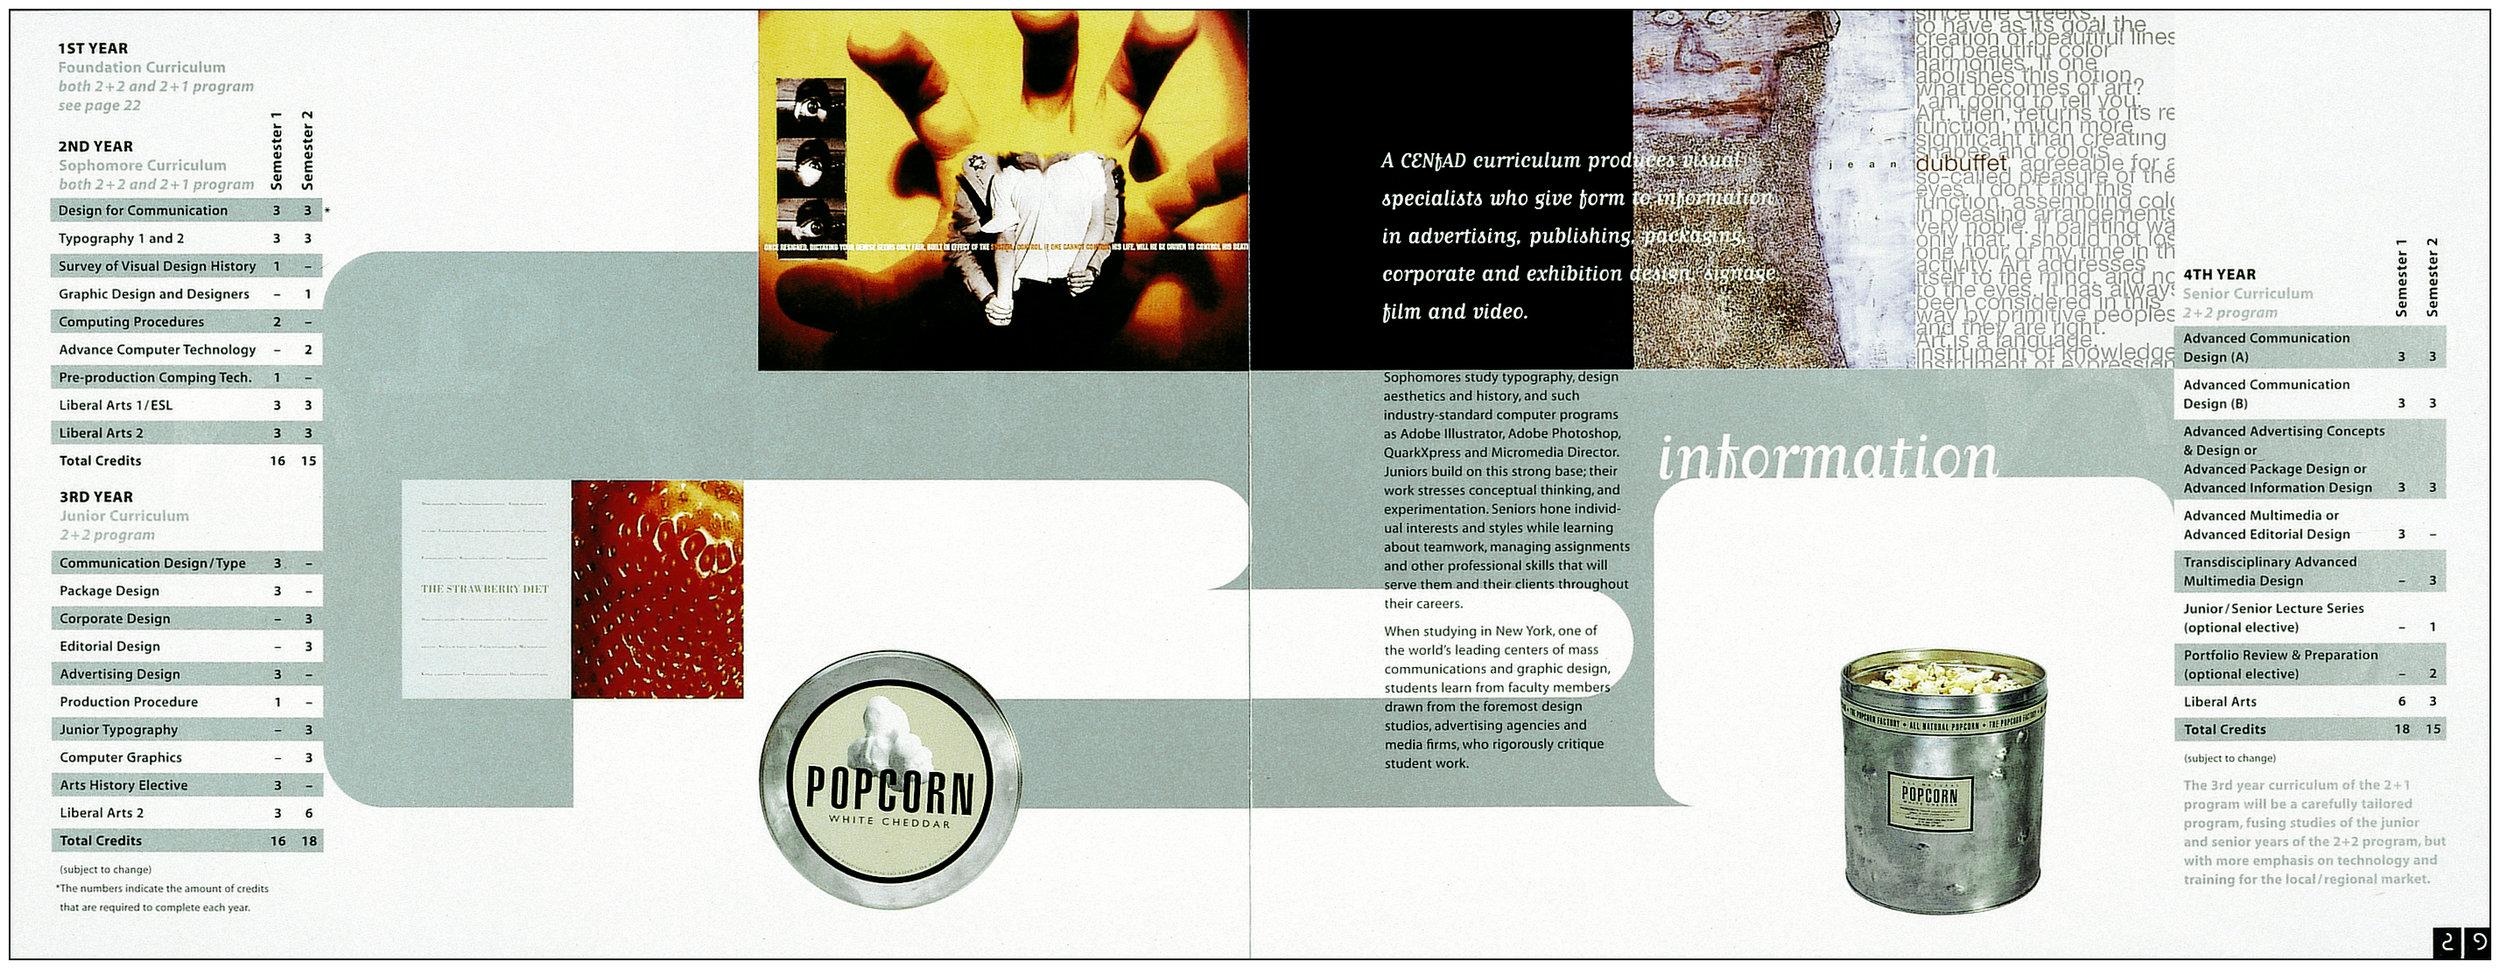 PORT_hires_CENfAD_Prospectus_Information (B6).jpg